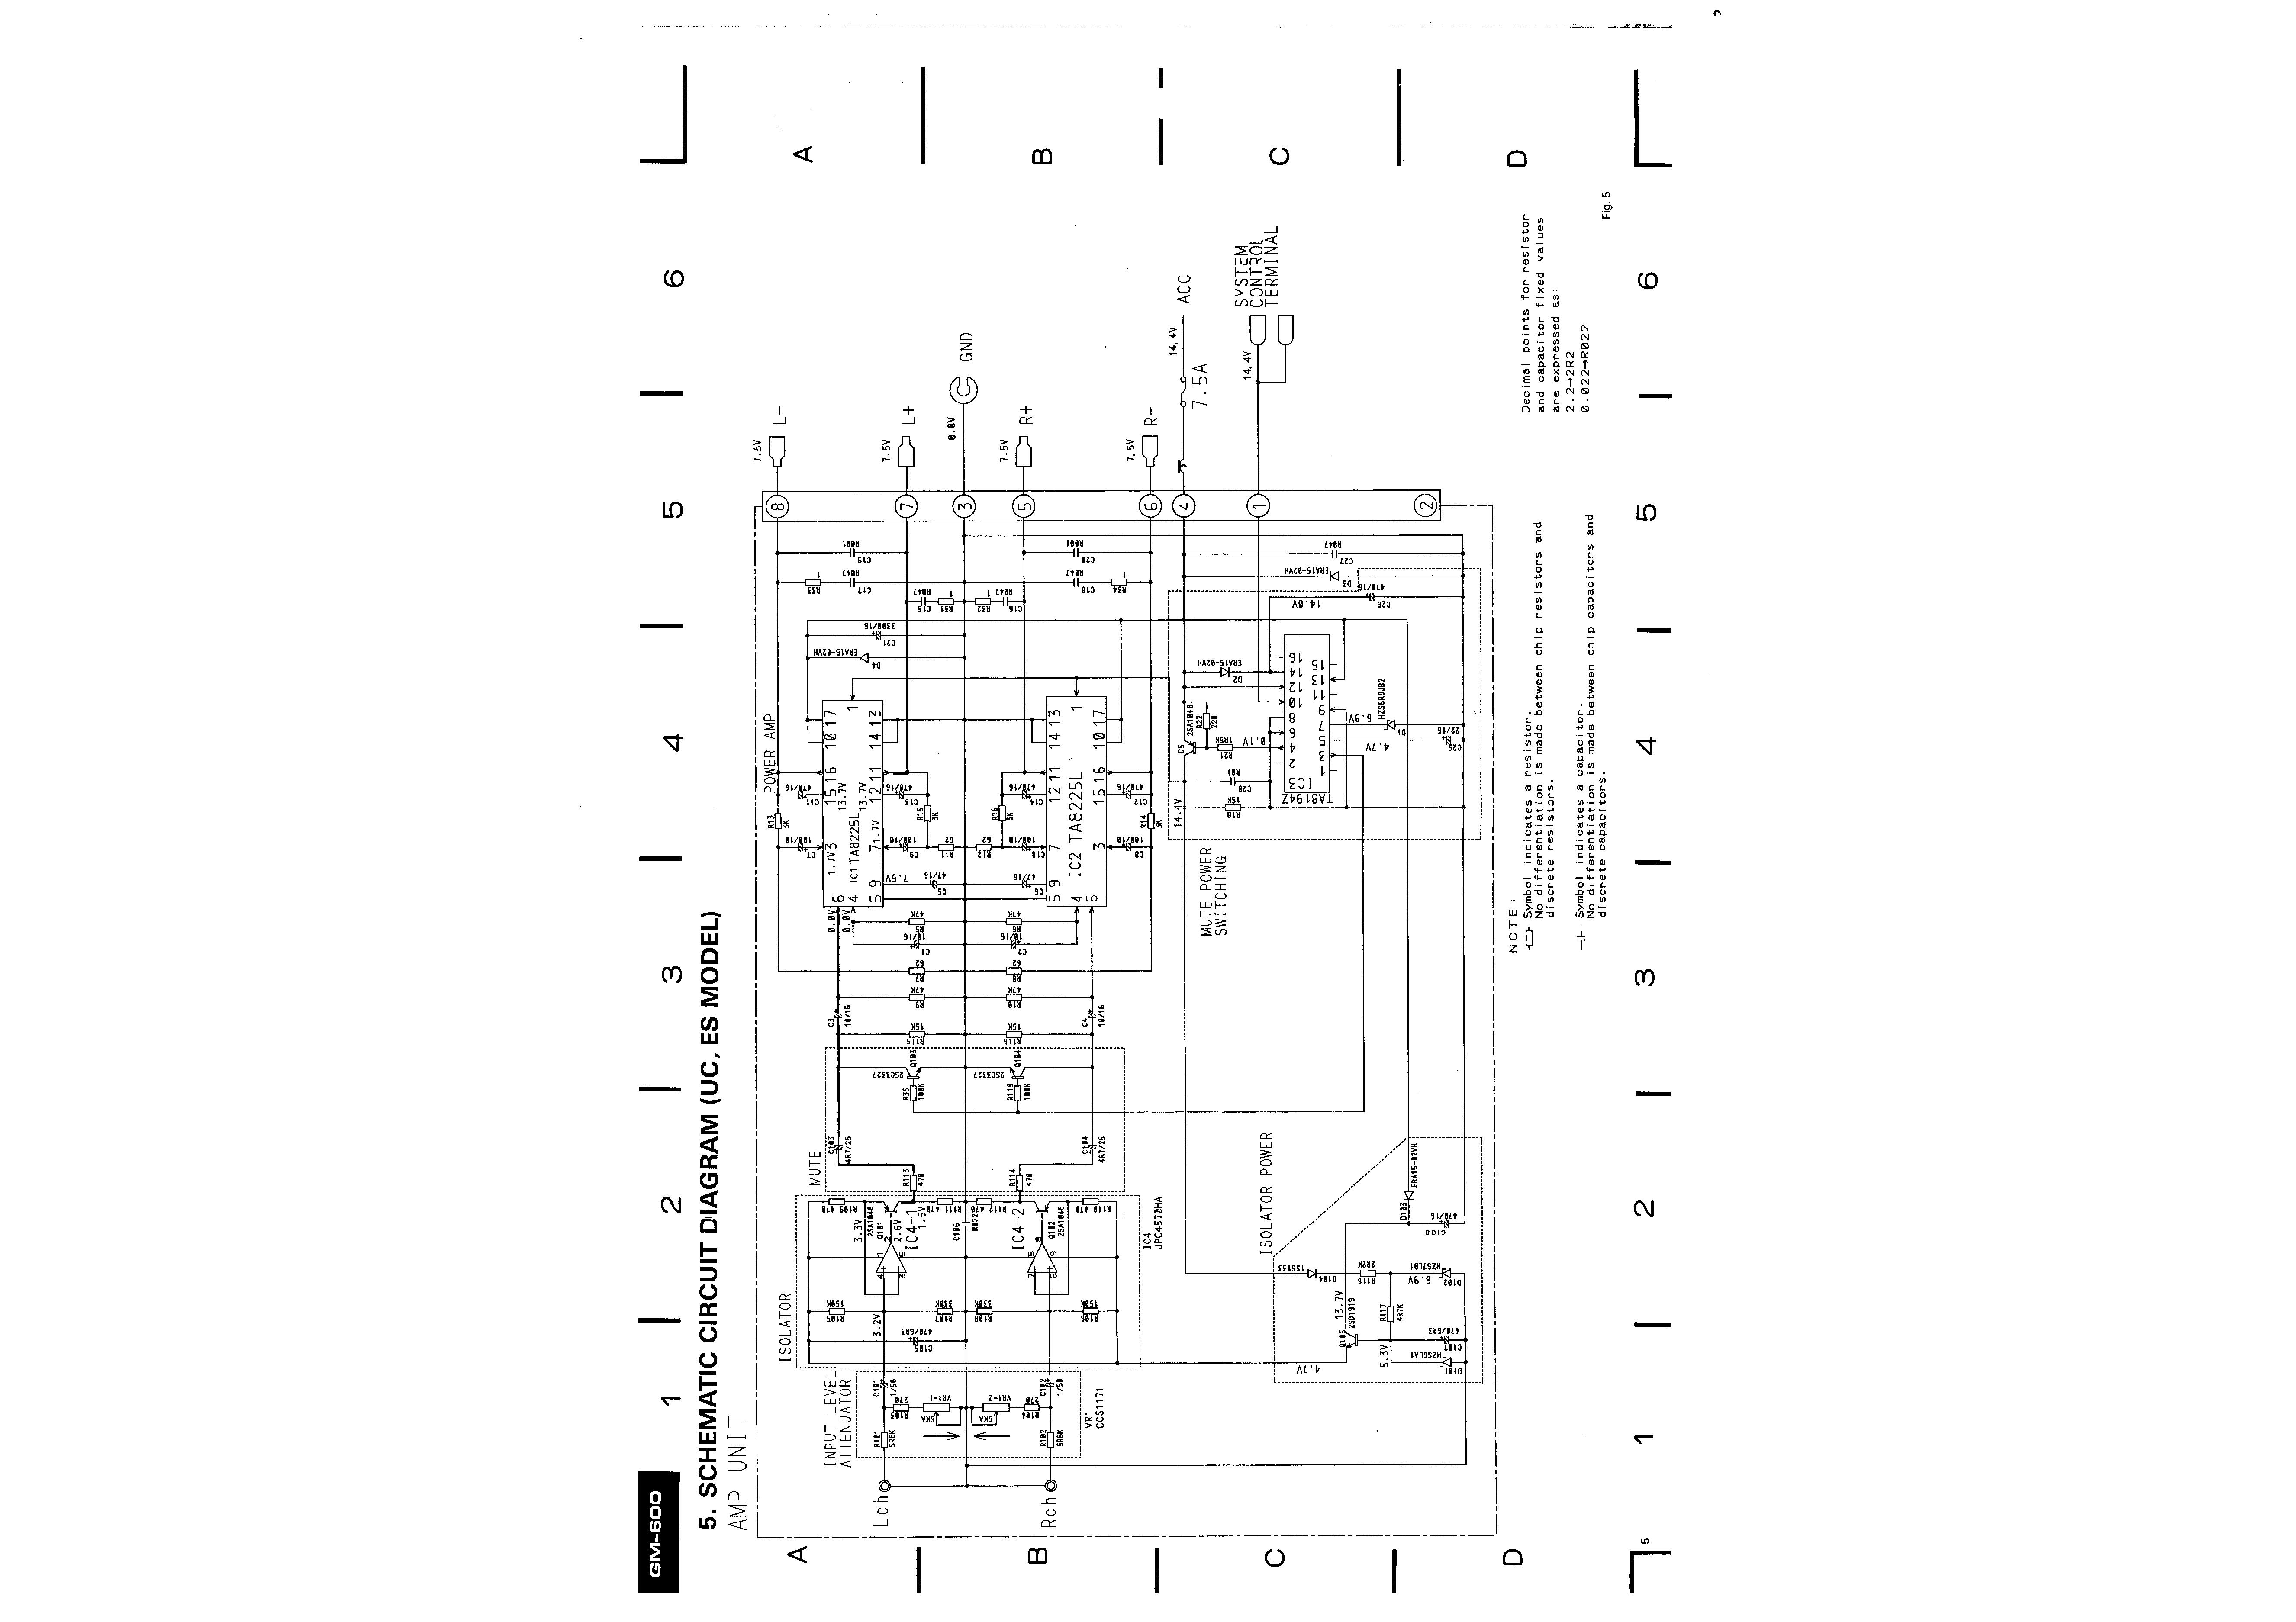 pioneer gm 620 wiring diagram - single phase house wiring diagram -  electrical-wiring.2020ok-jiwa.jeanjaures37.fr  wiring diagram resource